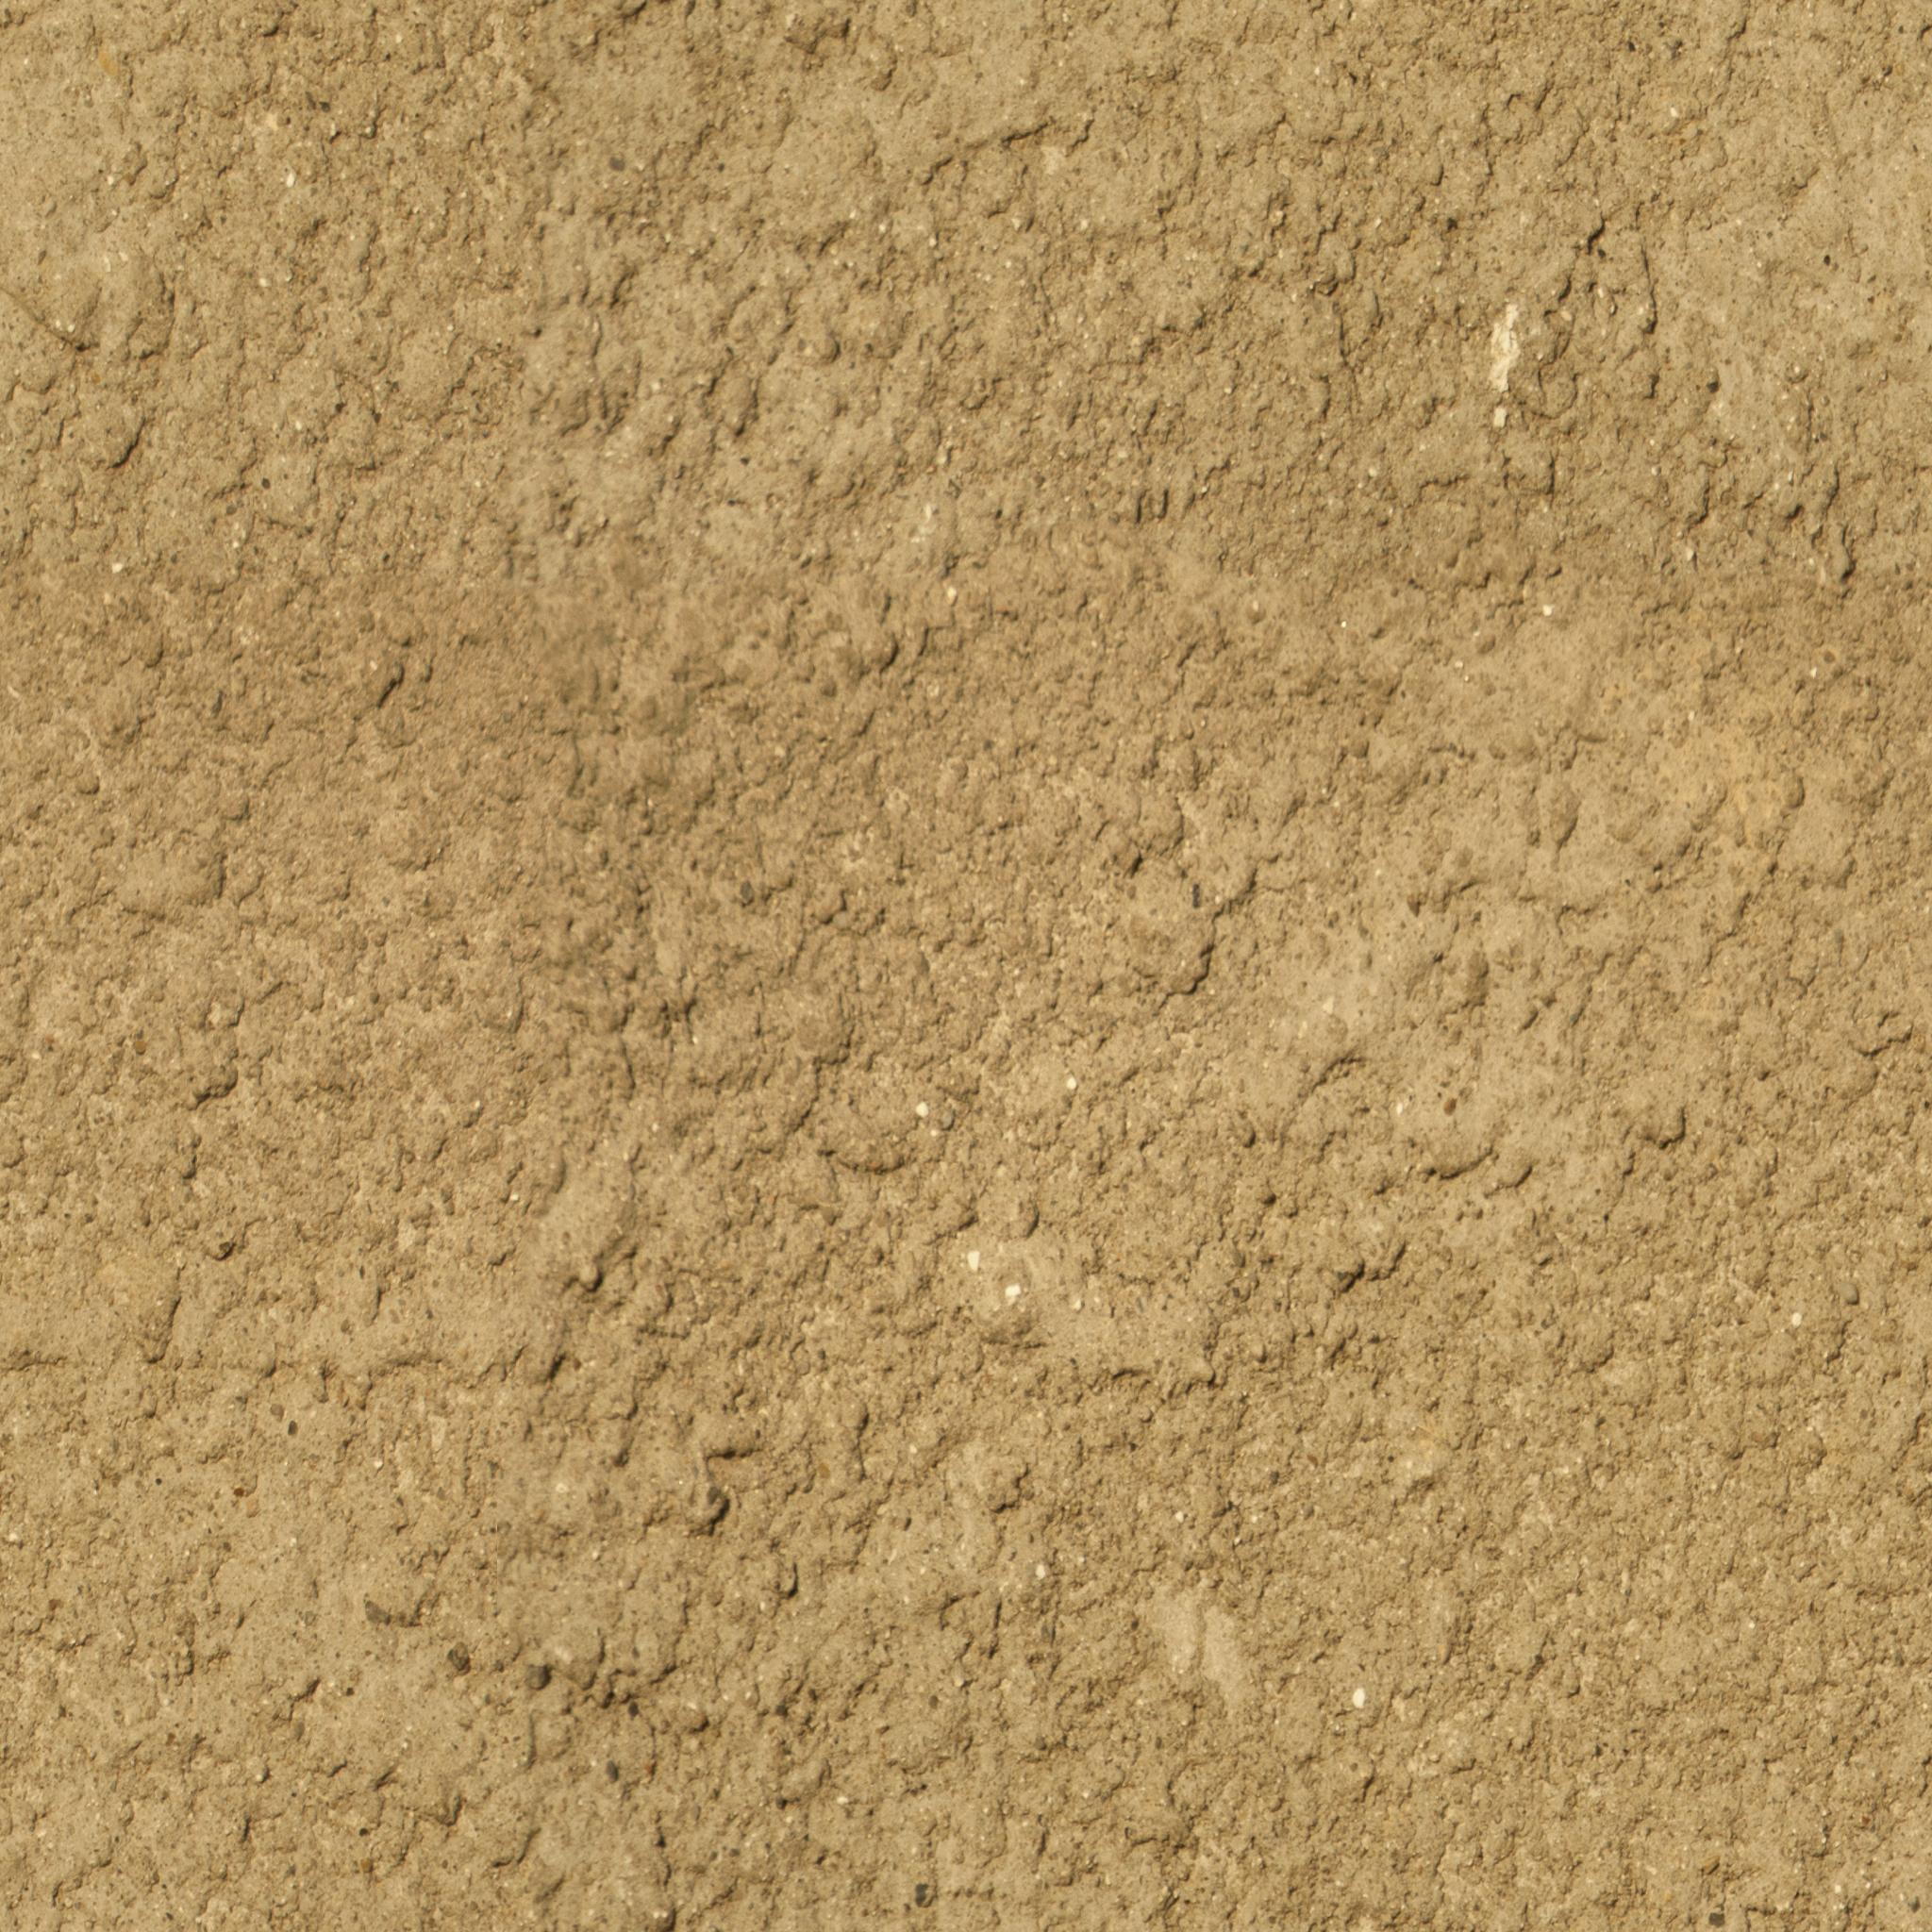 Coarse Brown Stucco.jpg